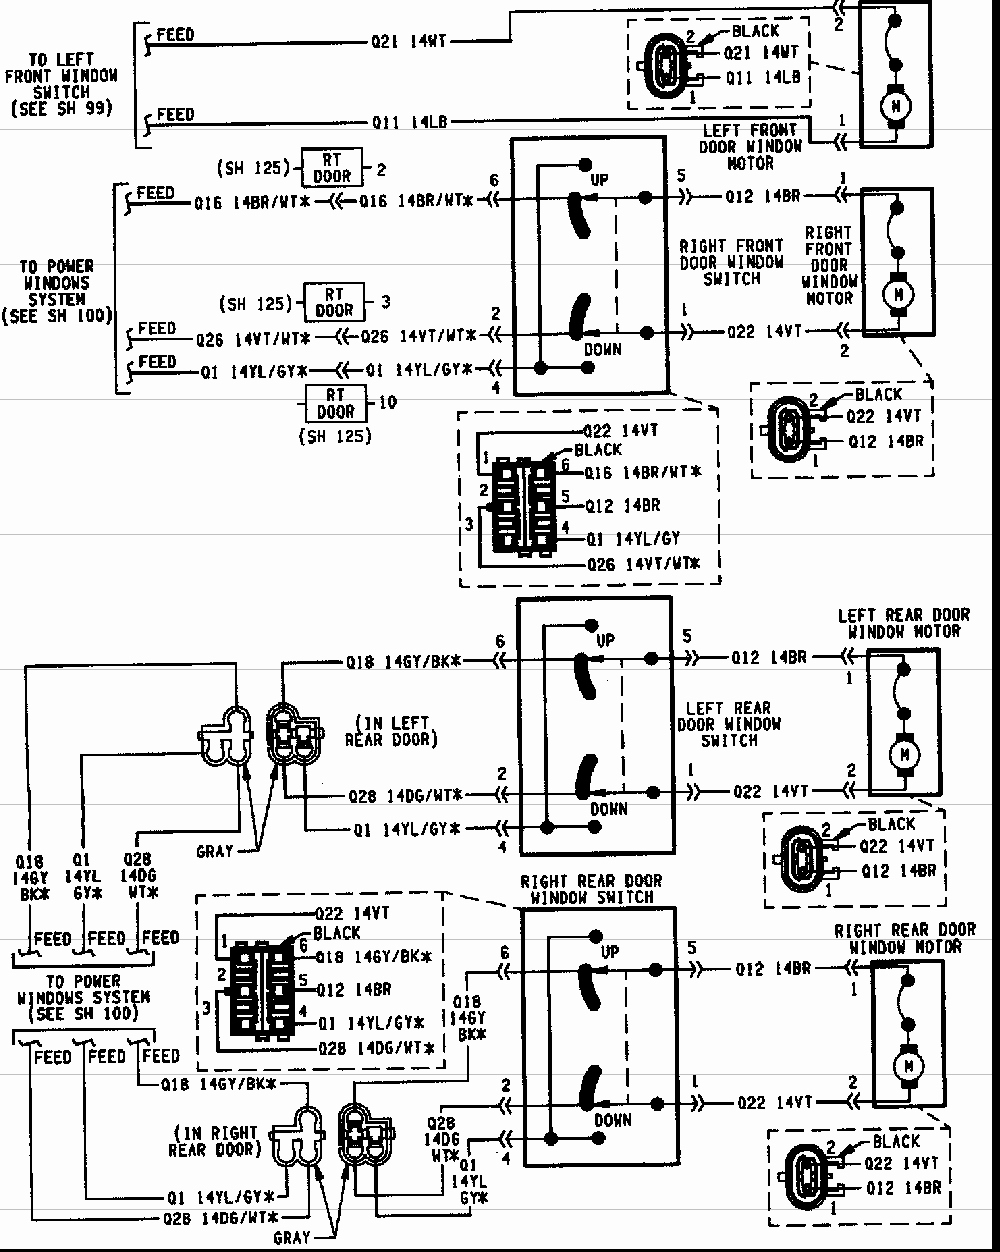 2002 jeep grand cherokee stereo wiring